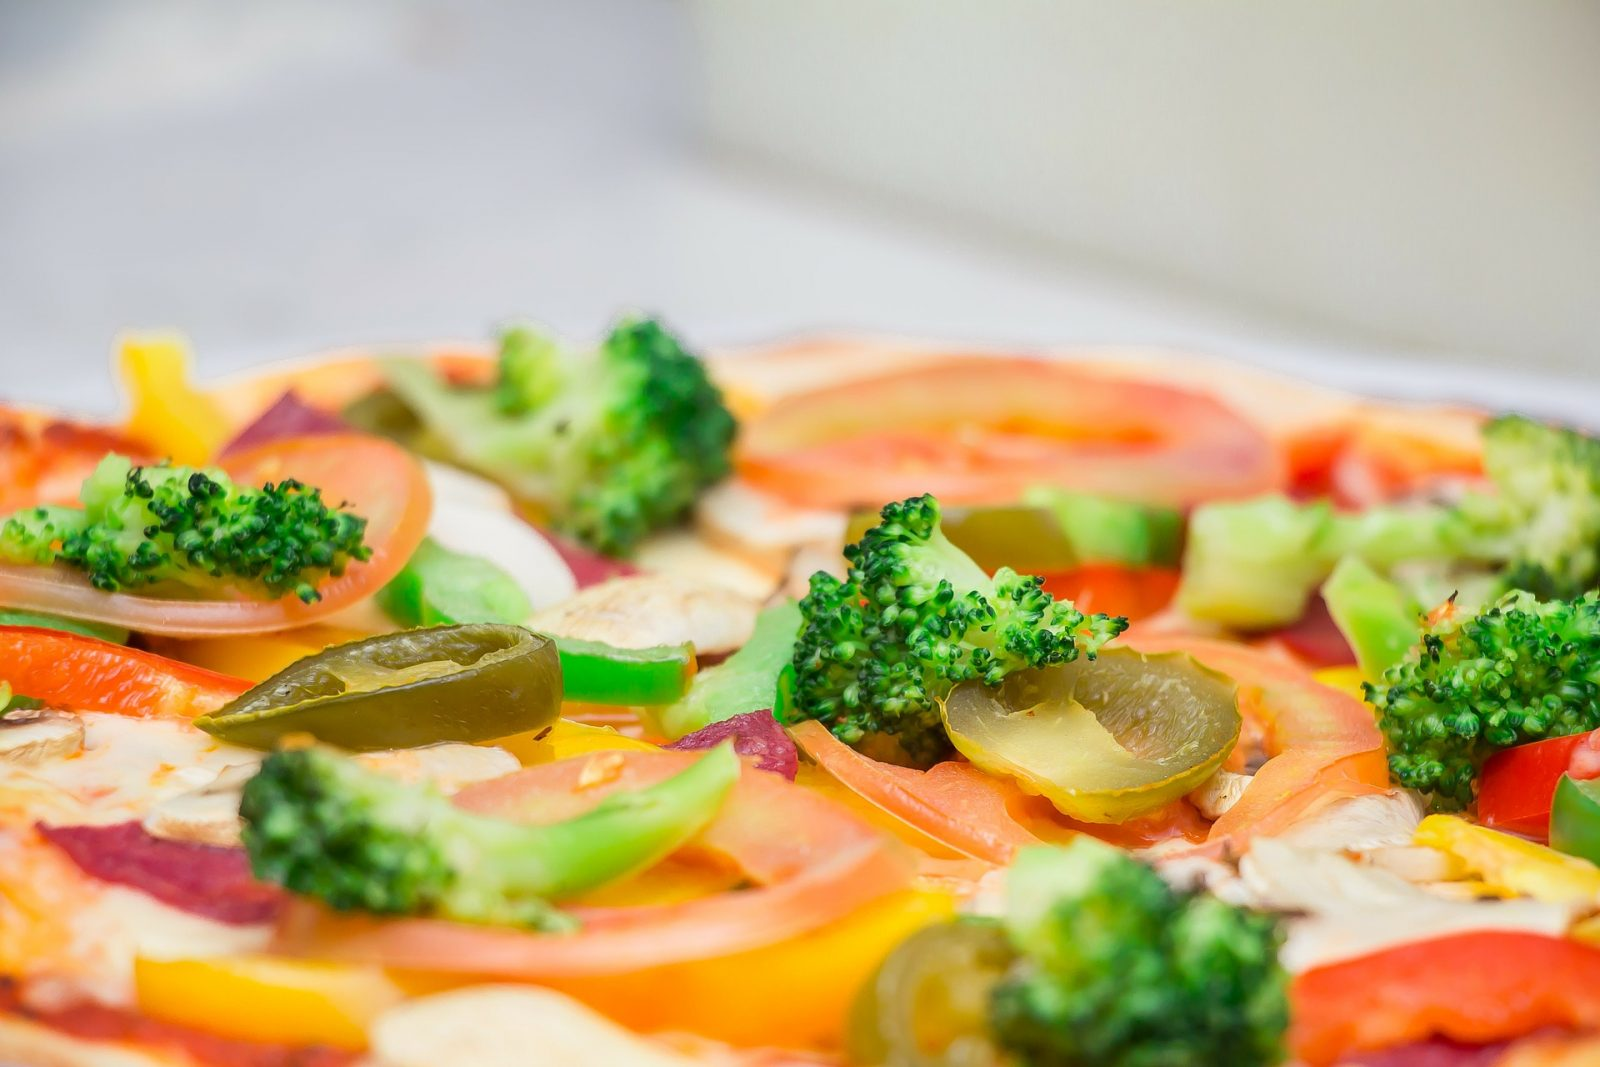 Gianolla Pizzas